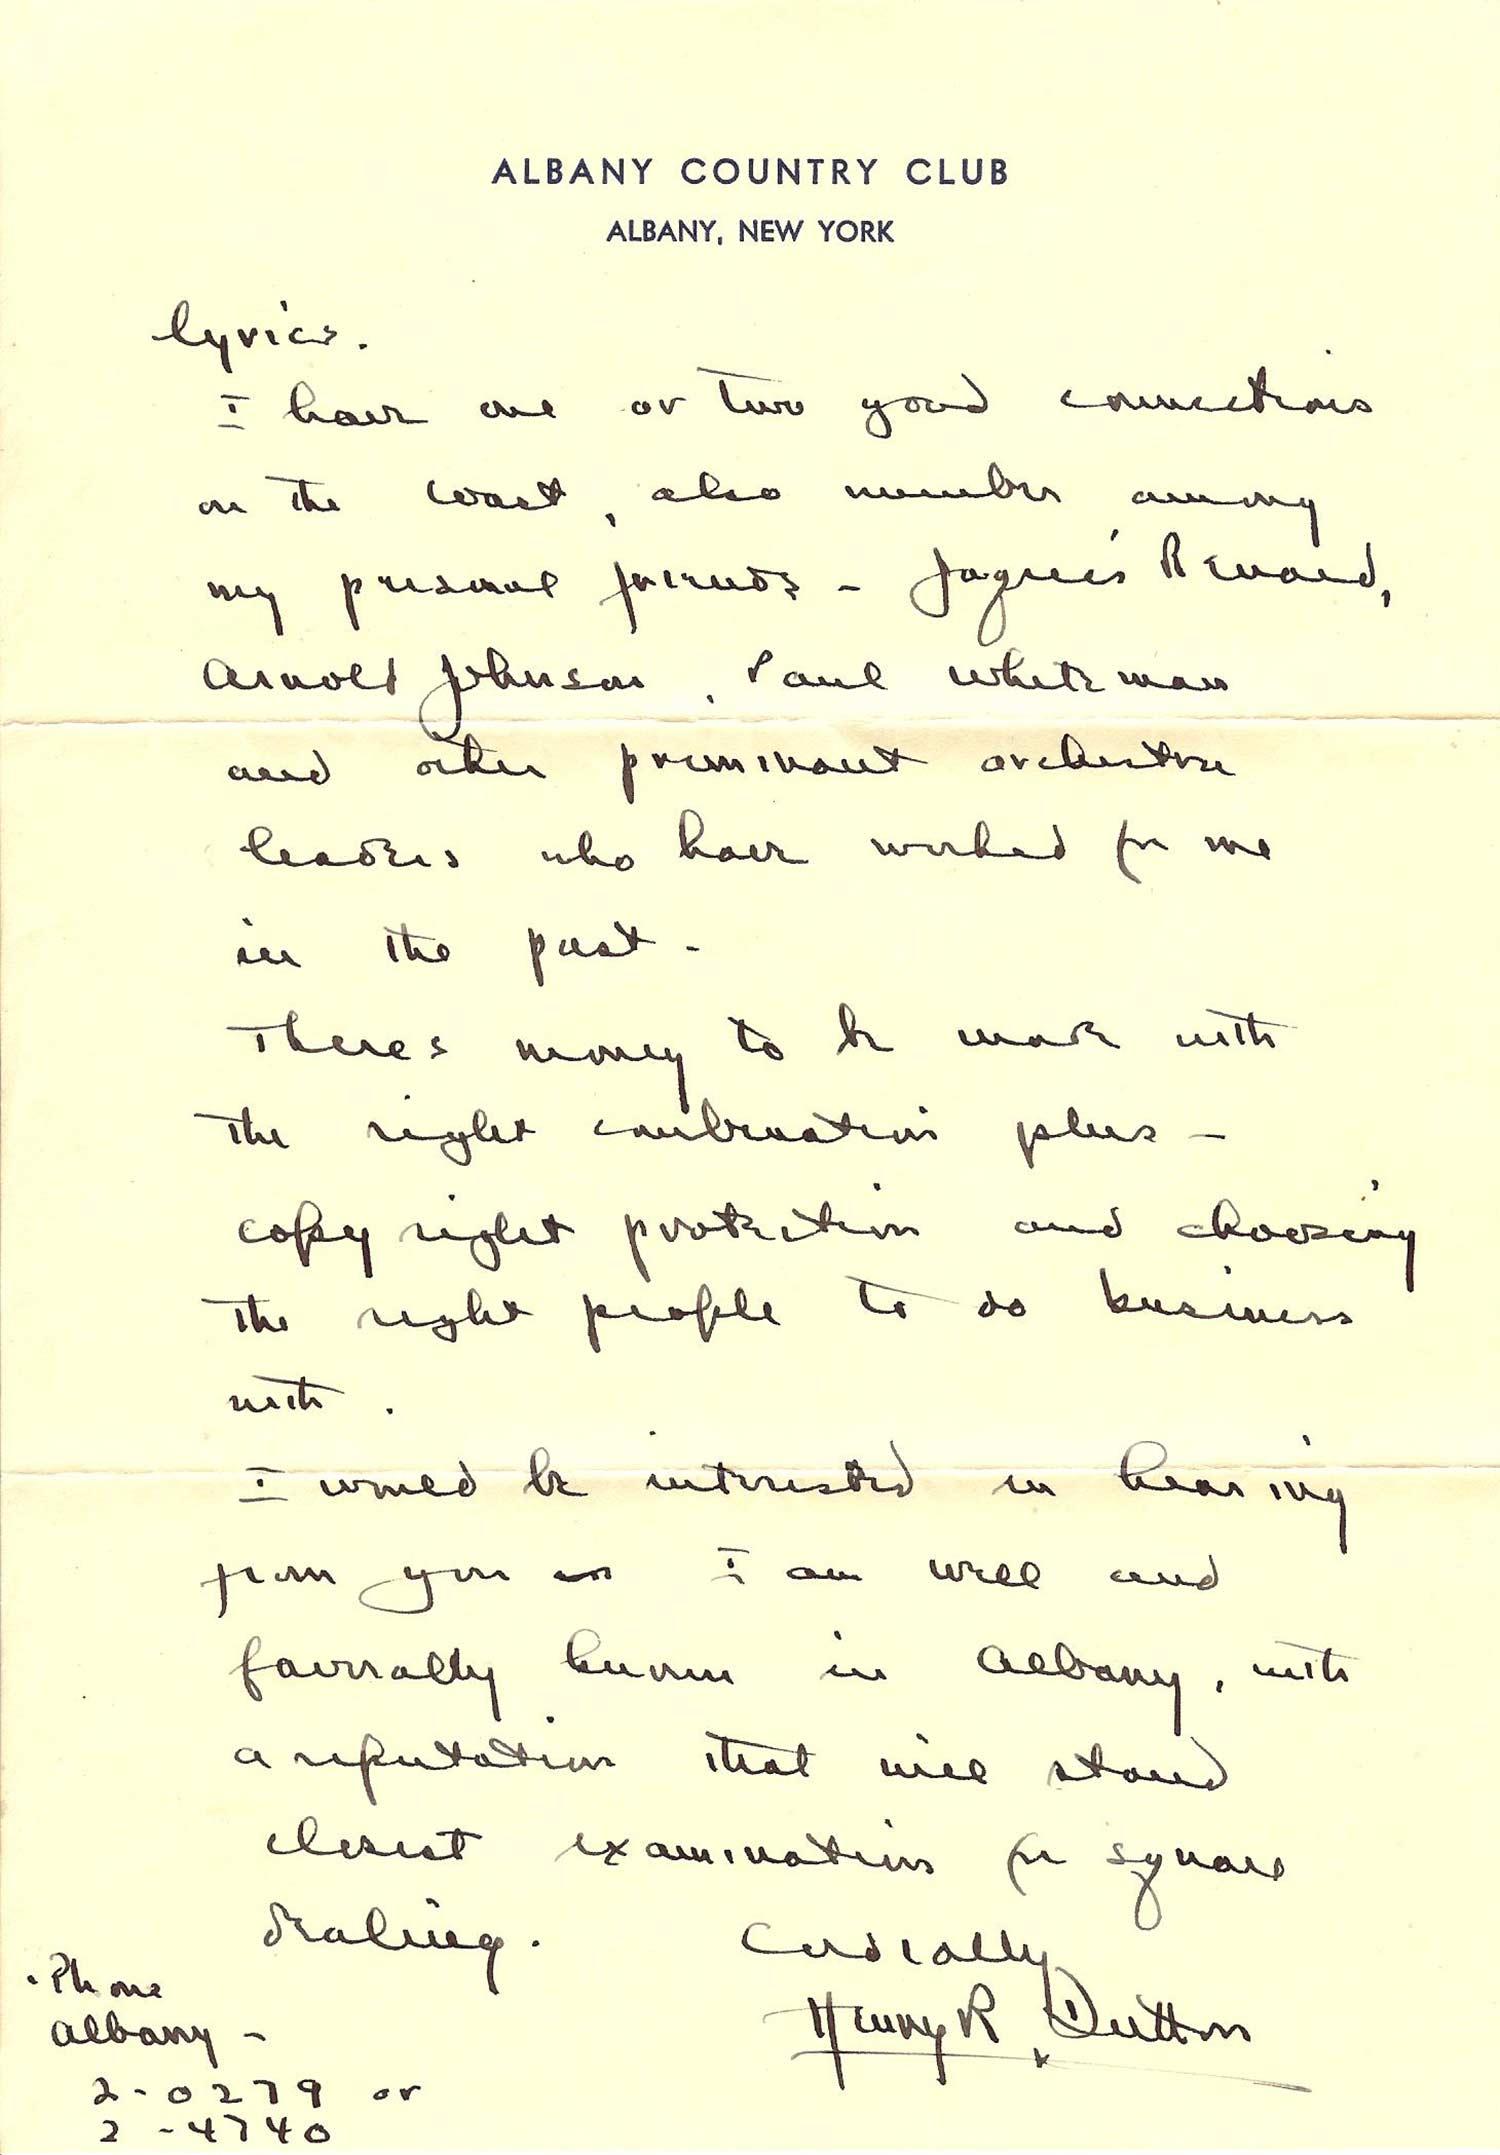 Henry R. Dutton Letter Page 2